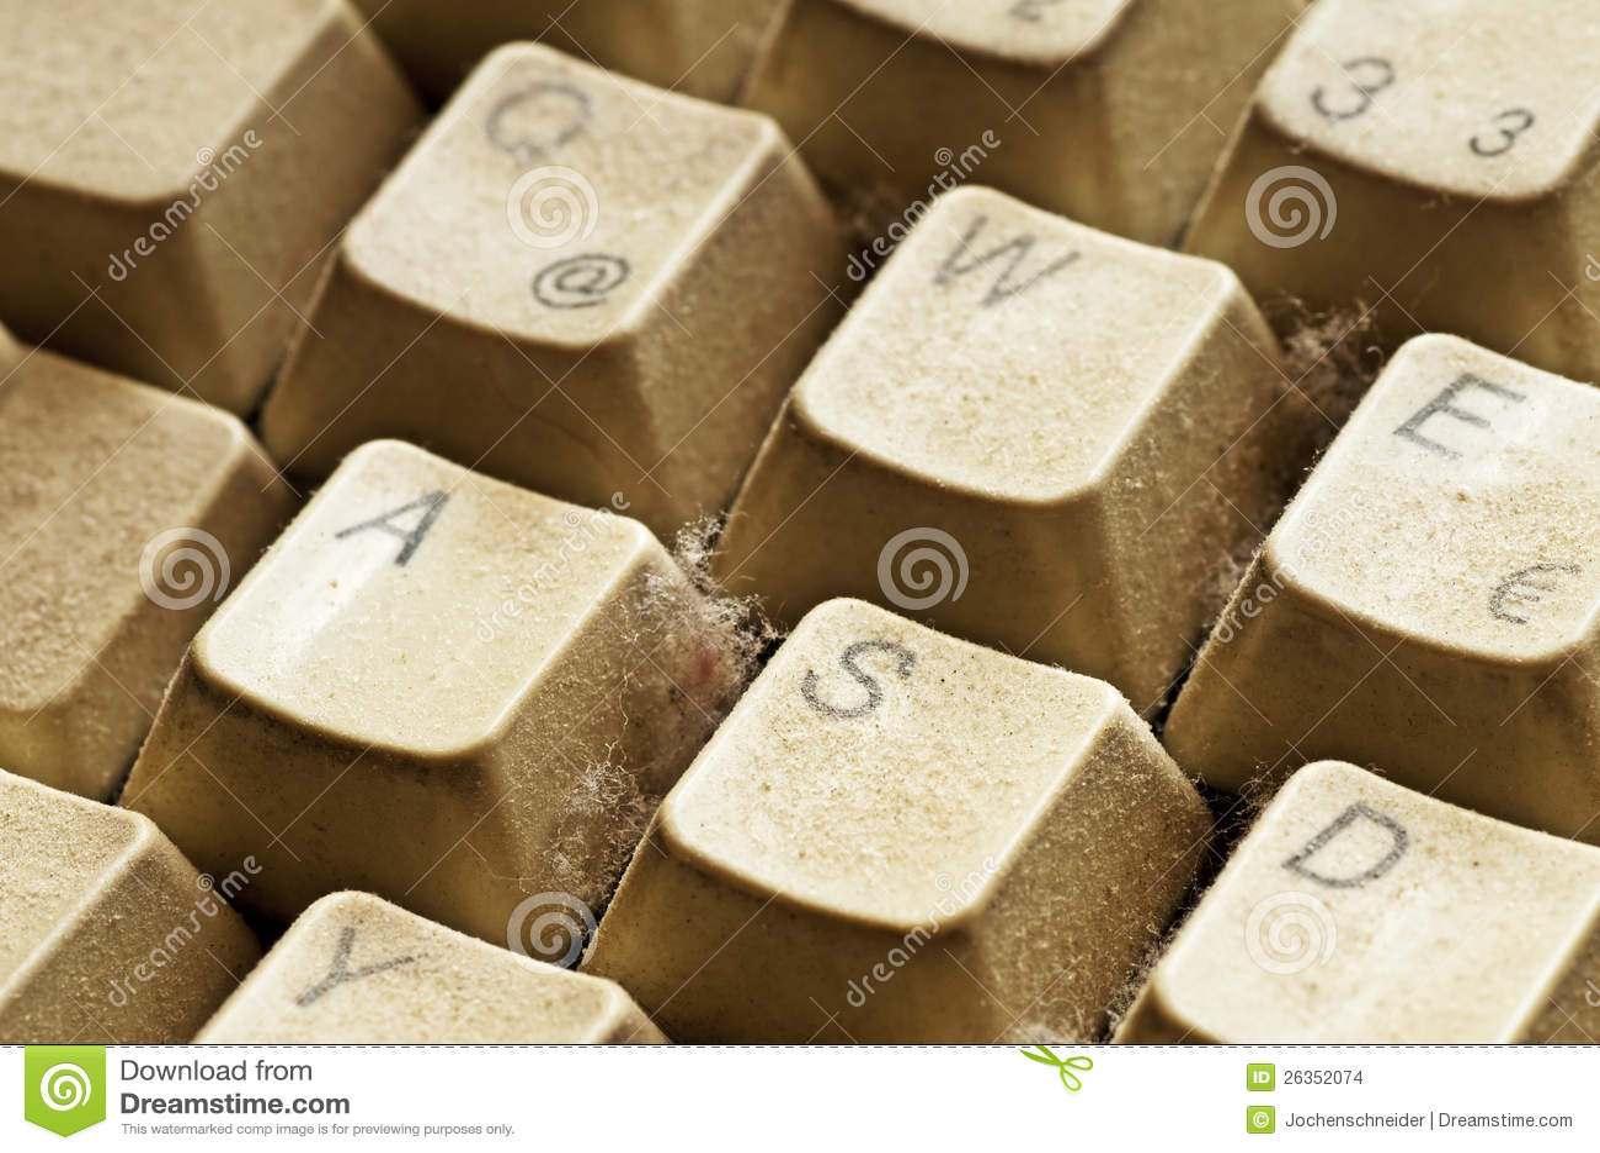 Staubige Tastatur